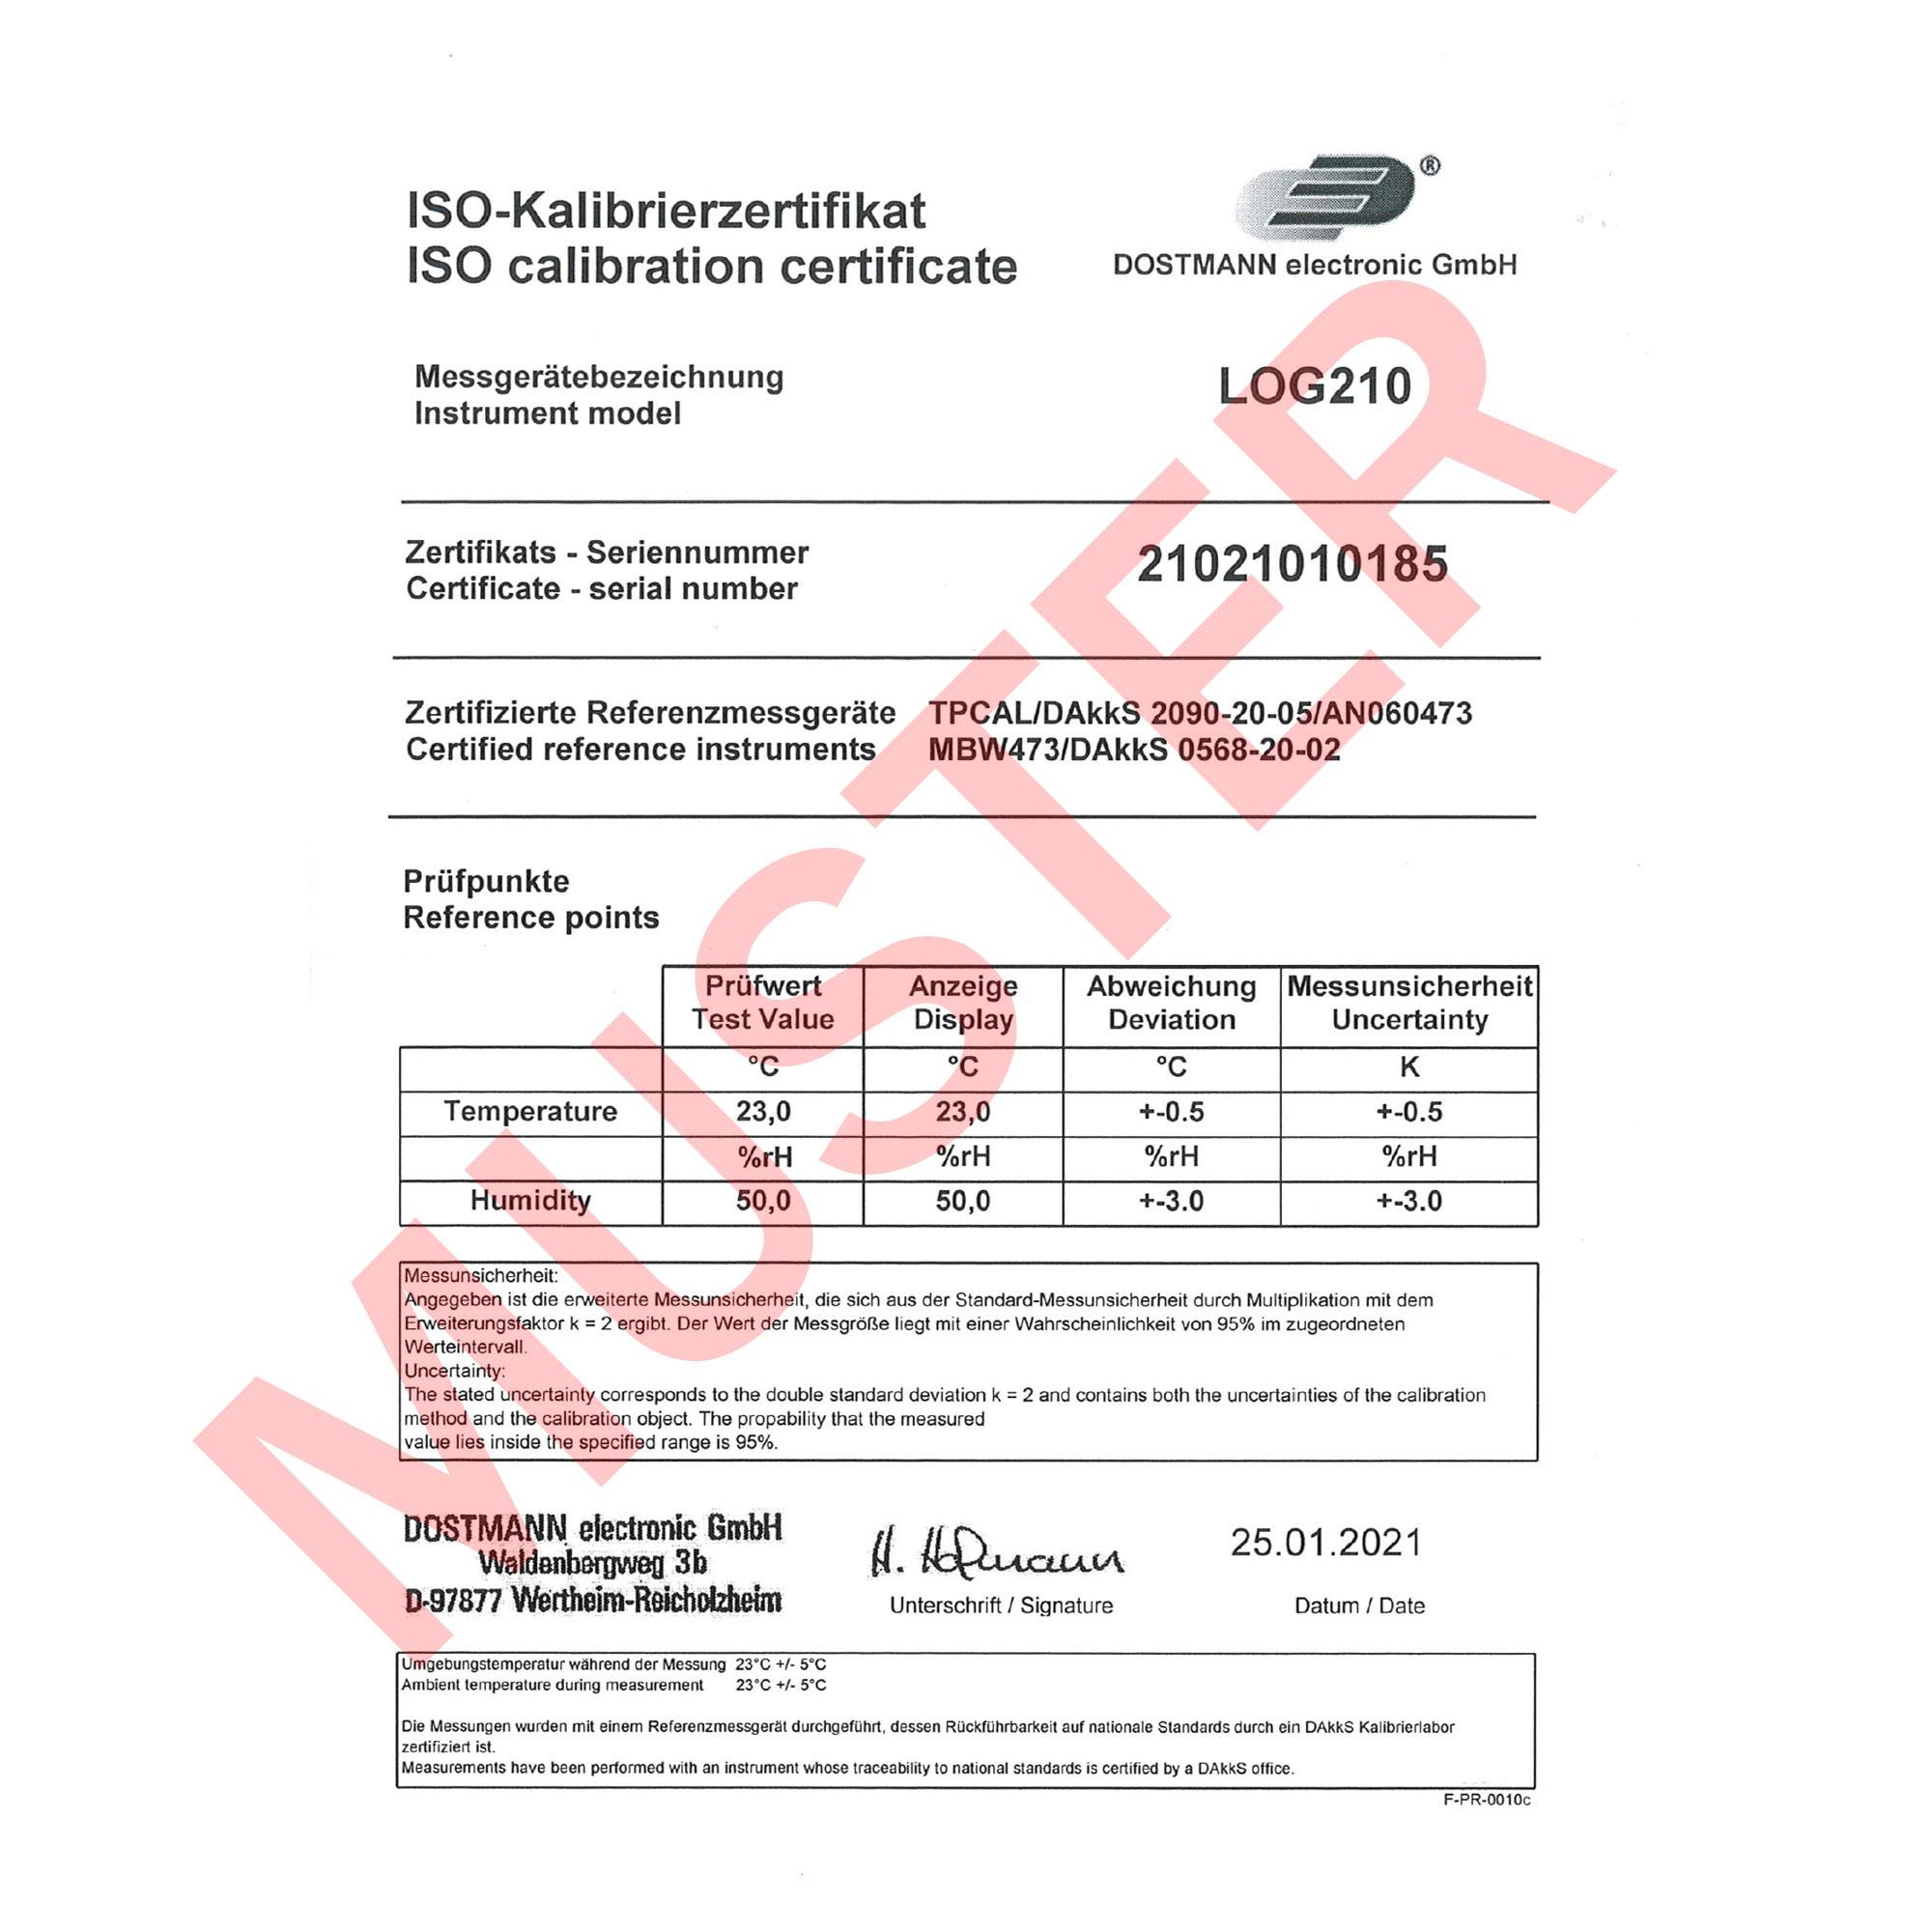 Zertifikat Muster Artikelnummer 311058.jpg